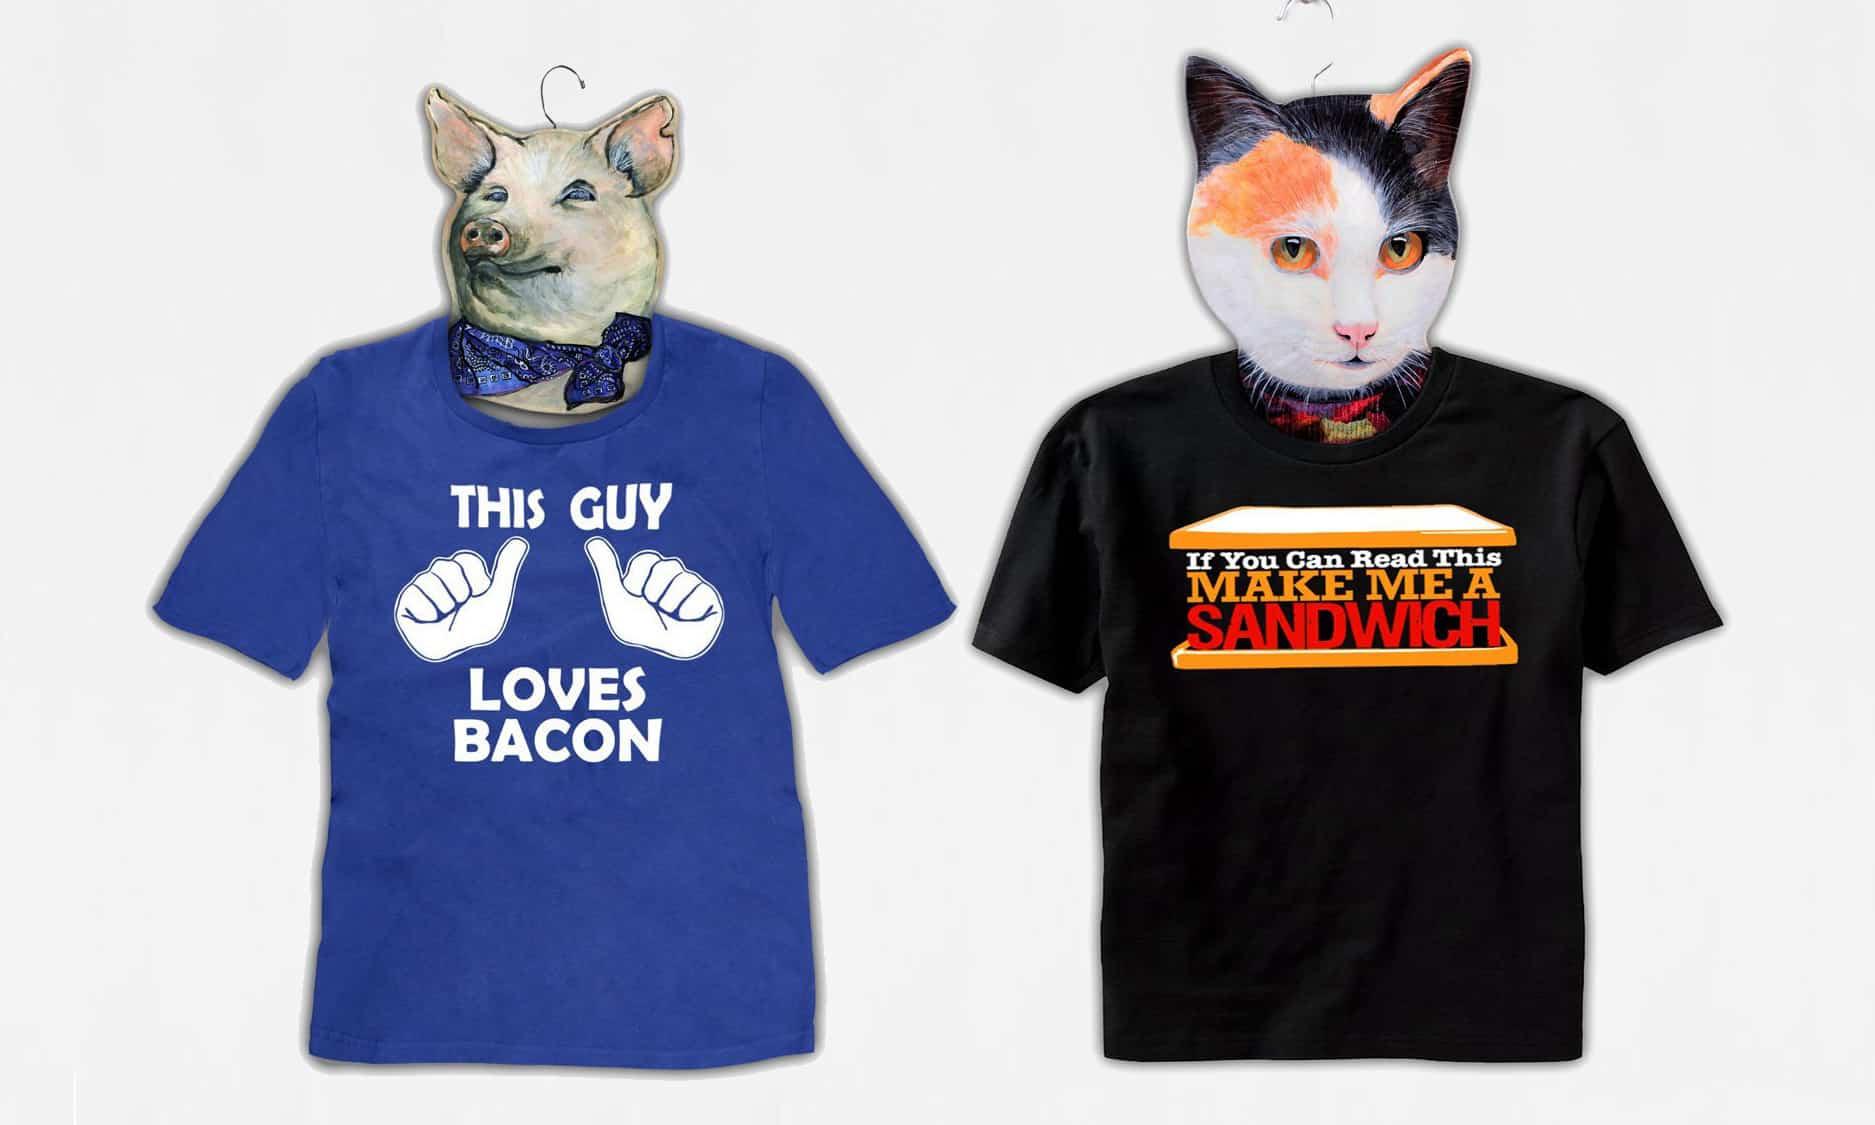 Cat in Human Clothes And Cat in Human Clothes